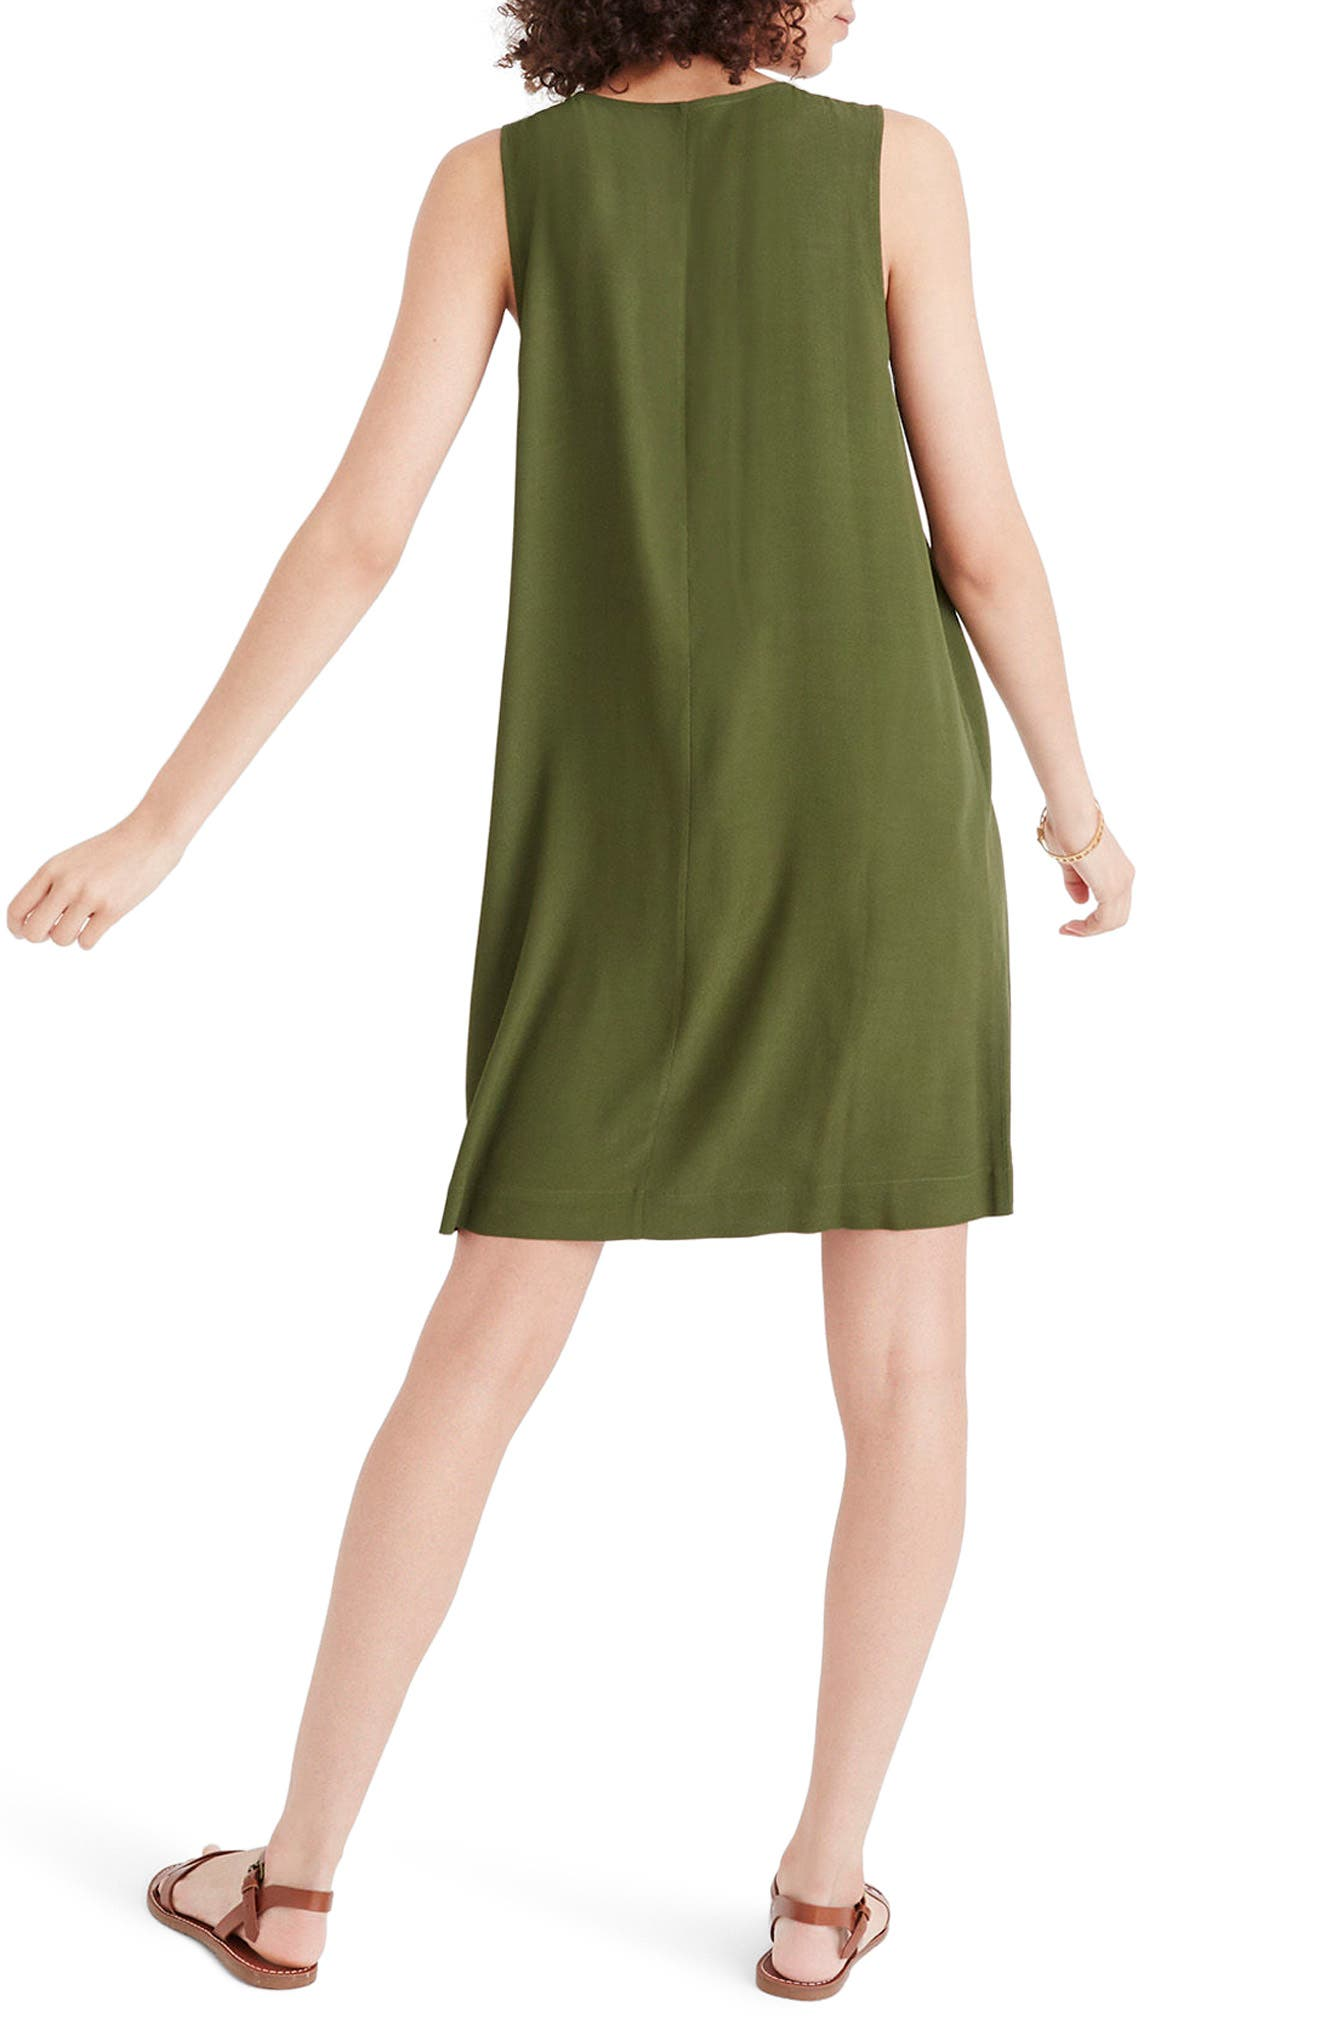 Heather Button Front Dress,                             Alternate thumbnail 2, color,                             300